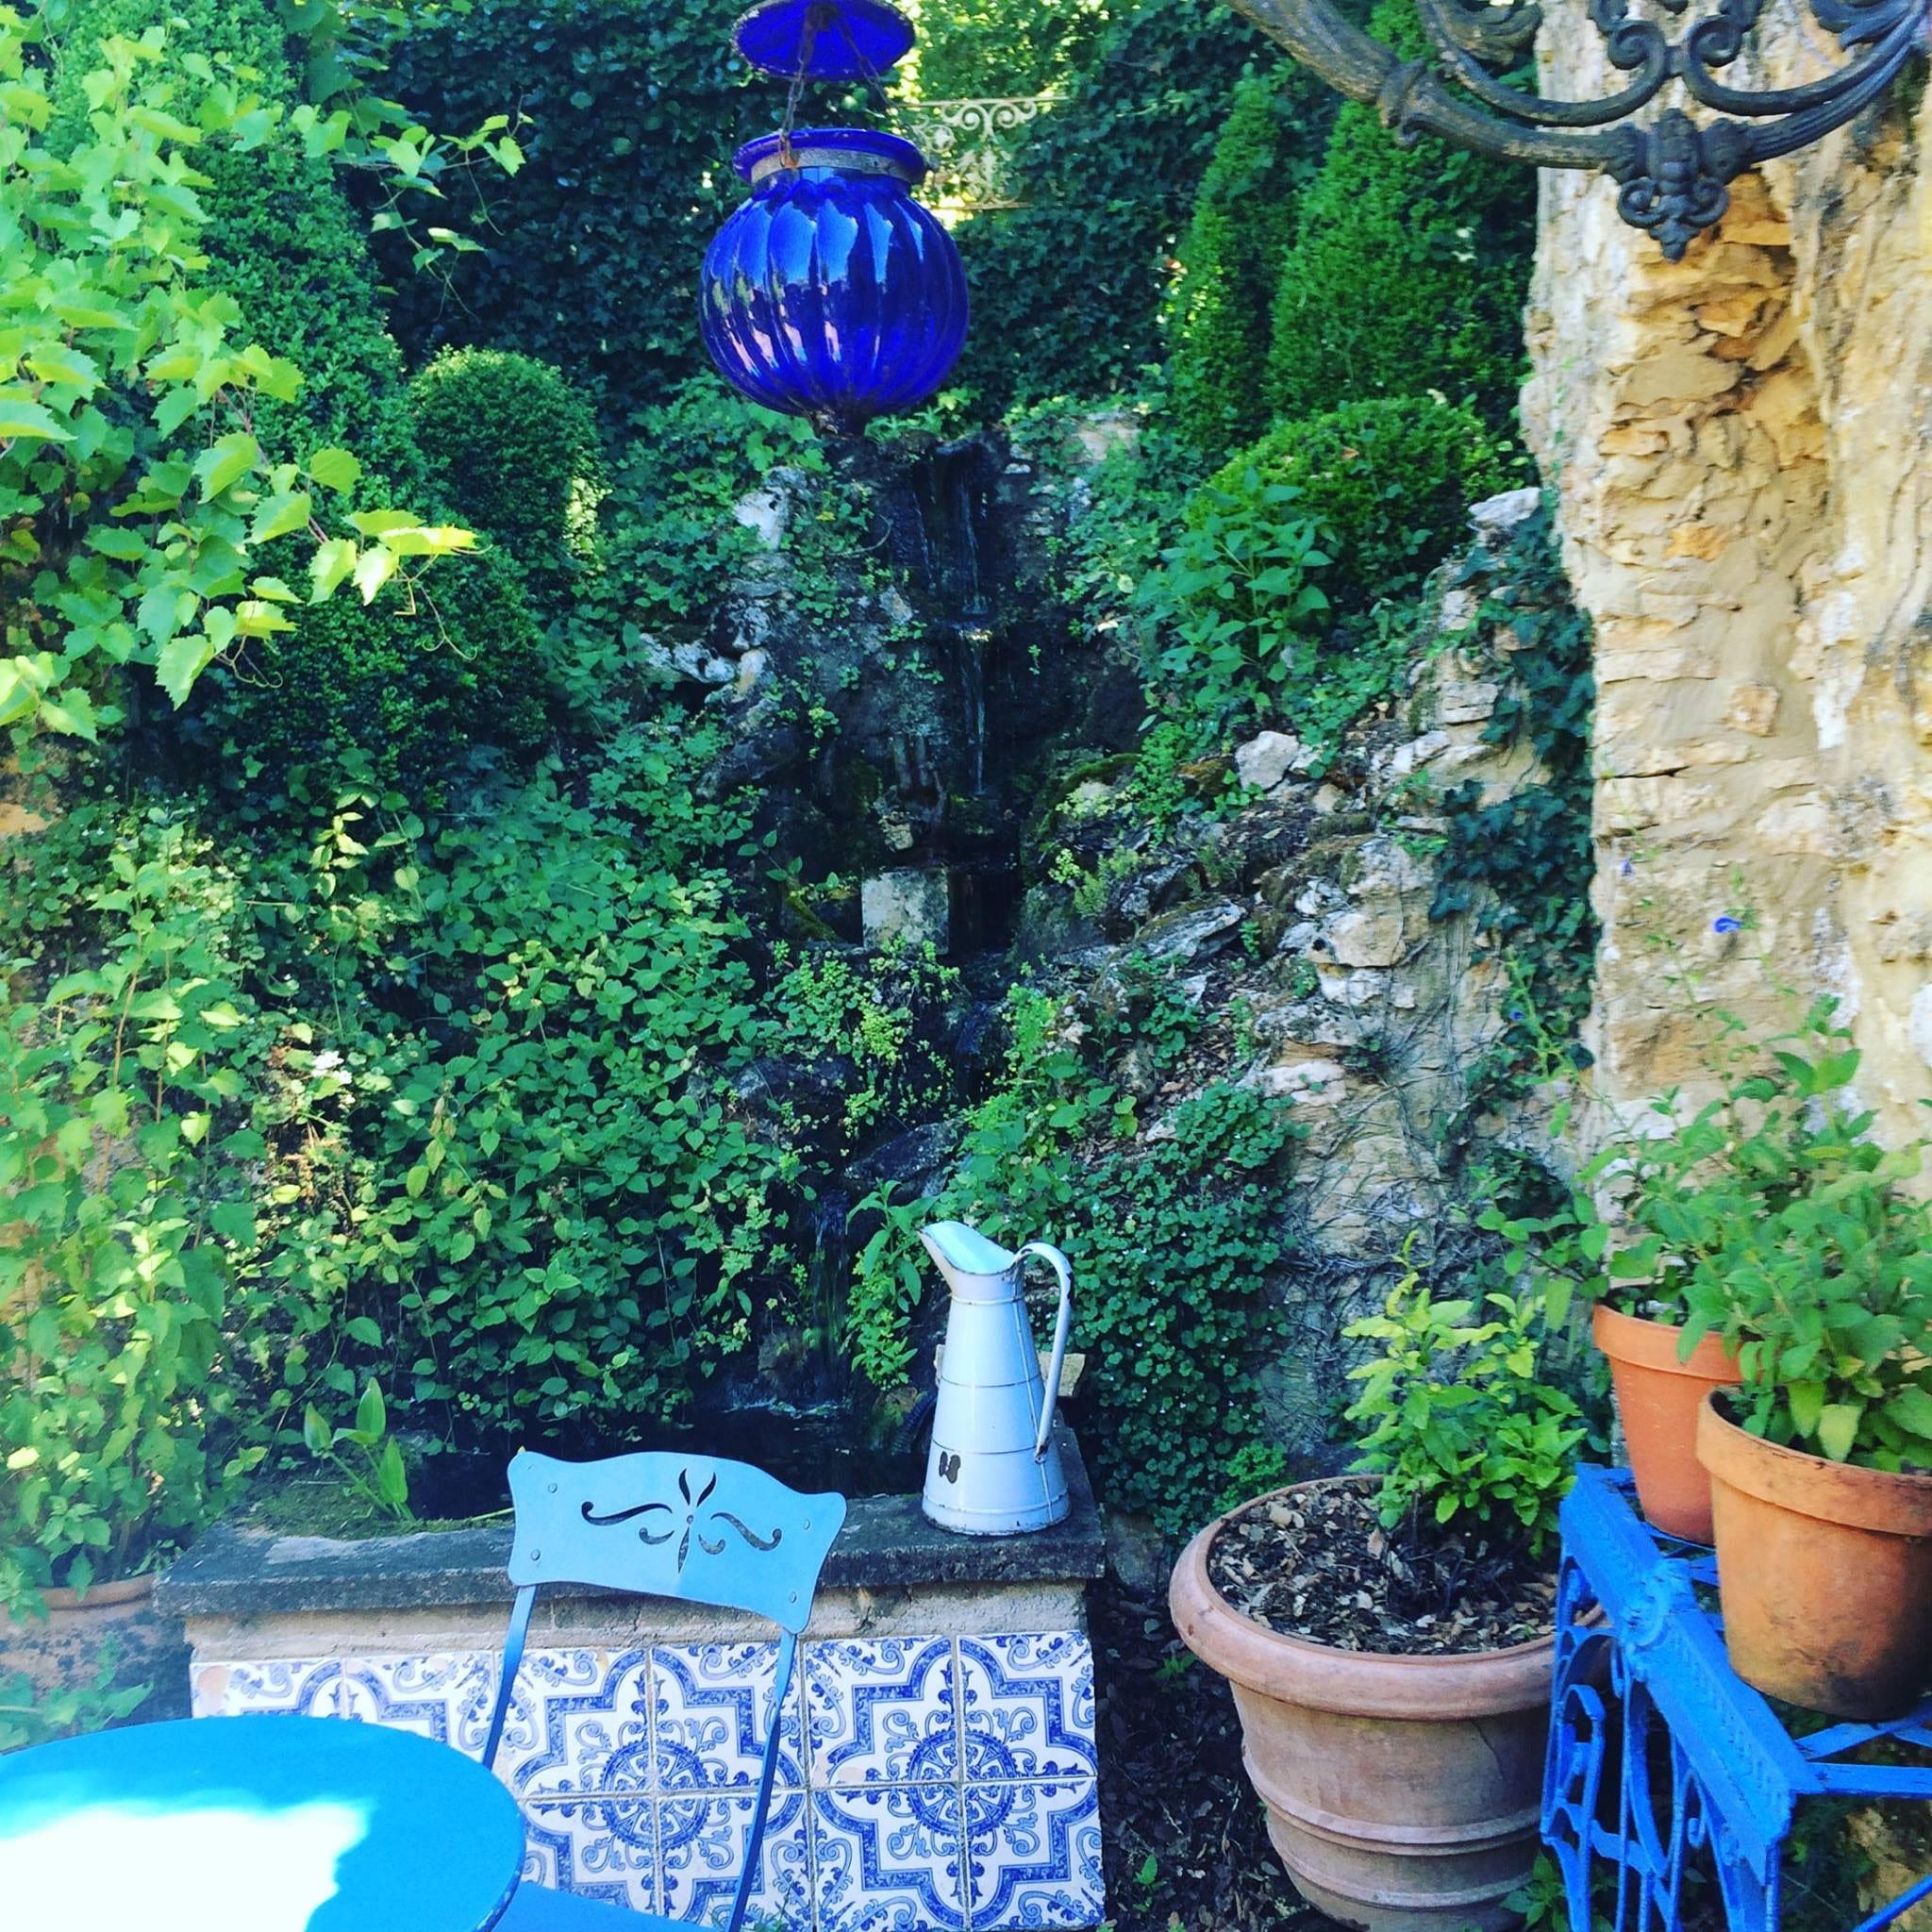 The Terrace at le jardin de cadiot